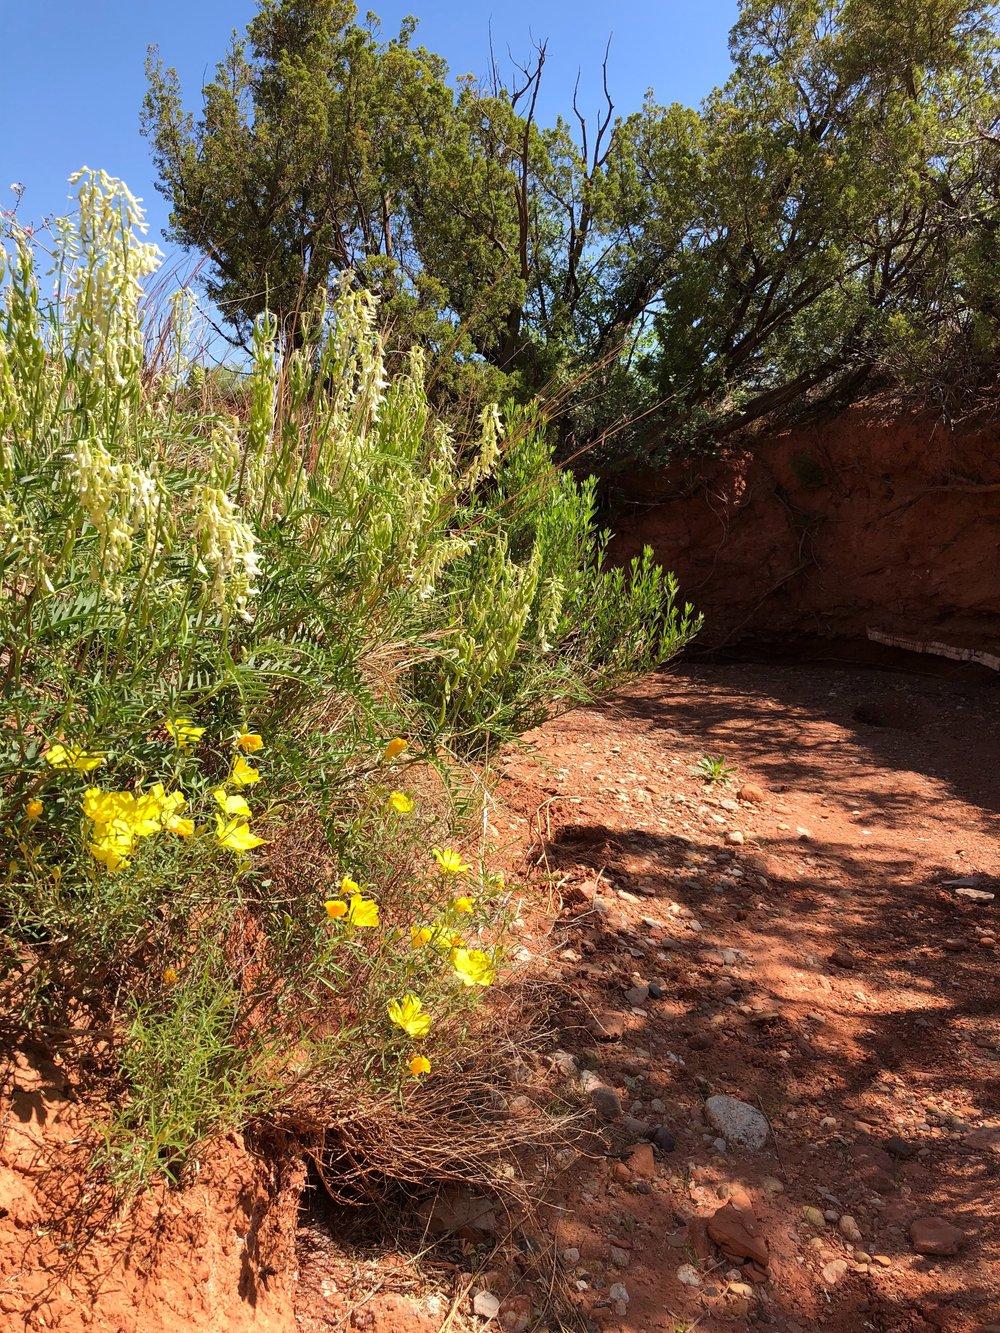 Astragalus racemosus, Cream Milkvetch with Calylophus berlandieri, Sundrops